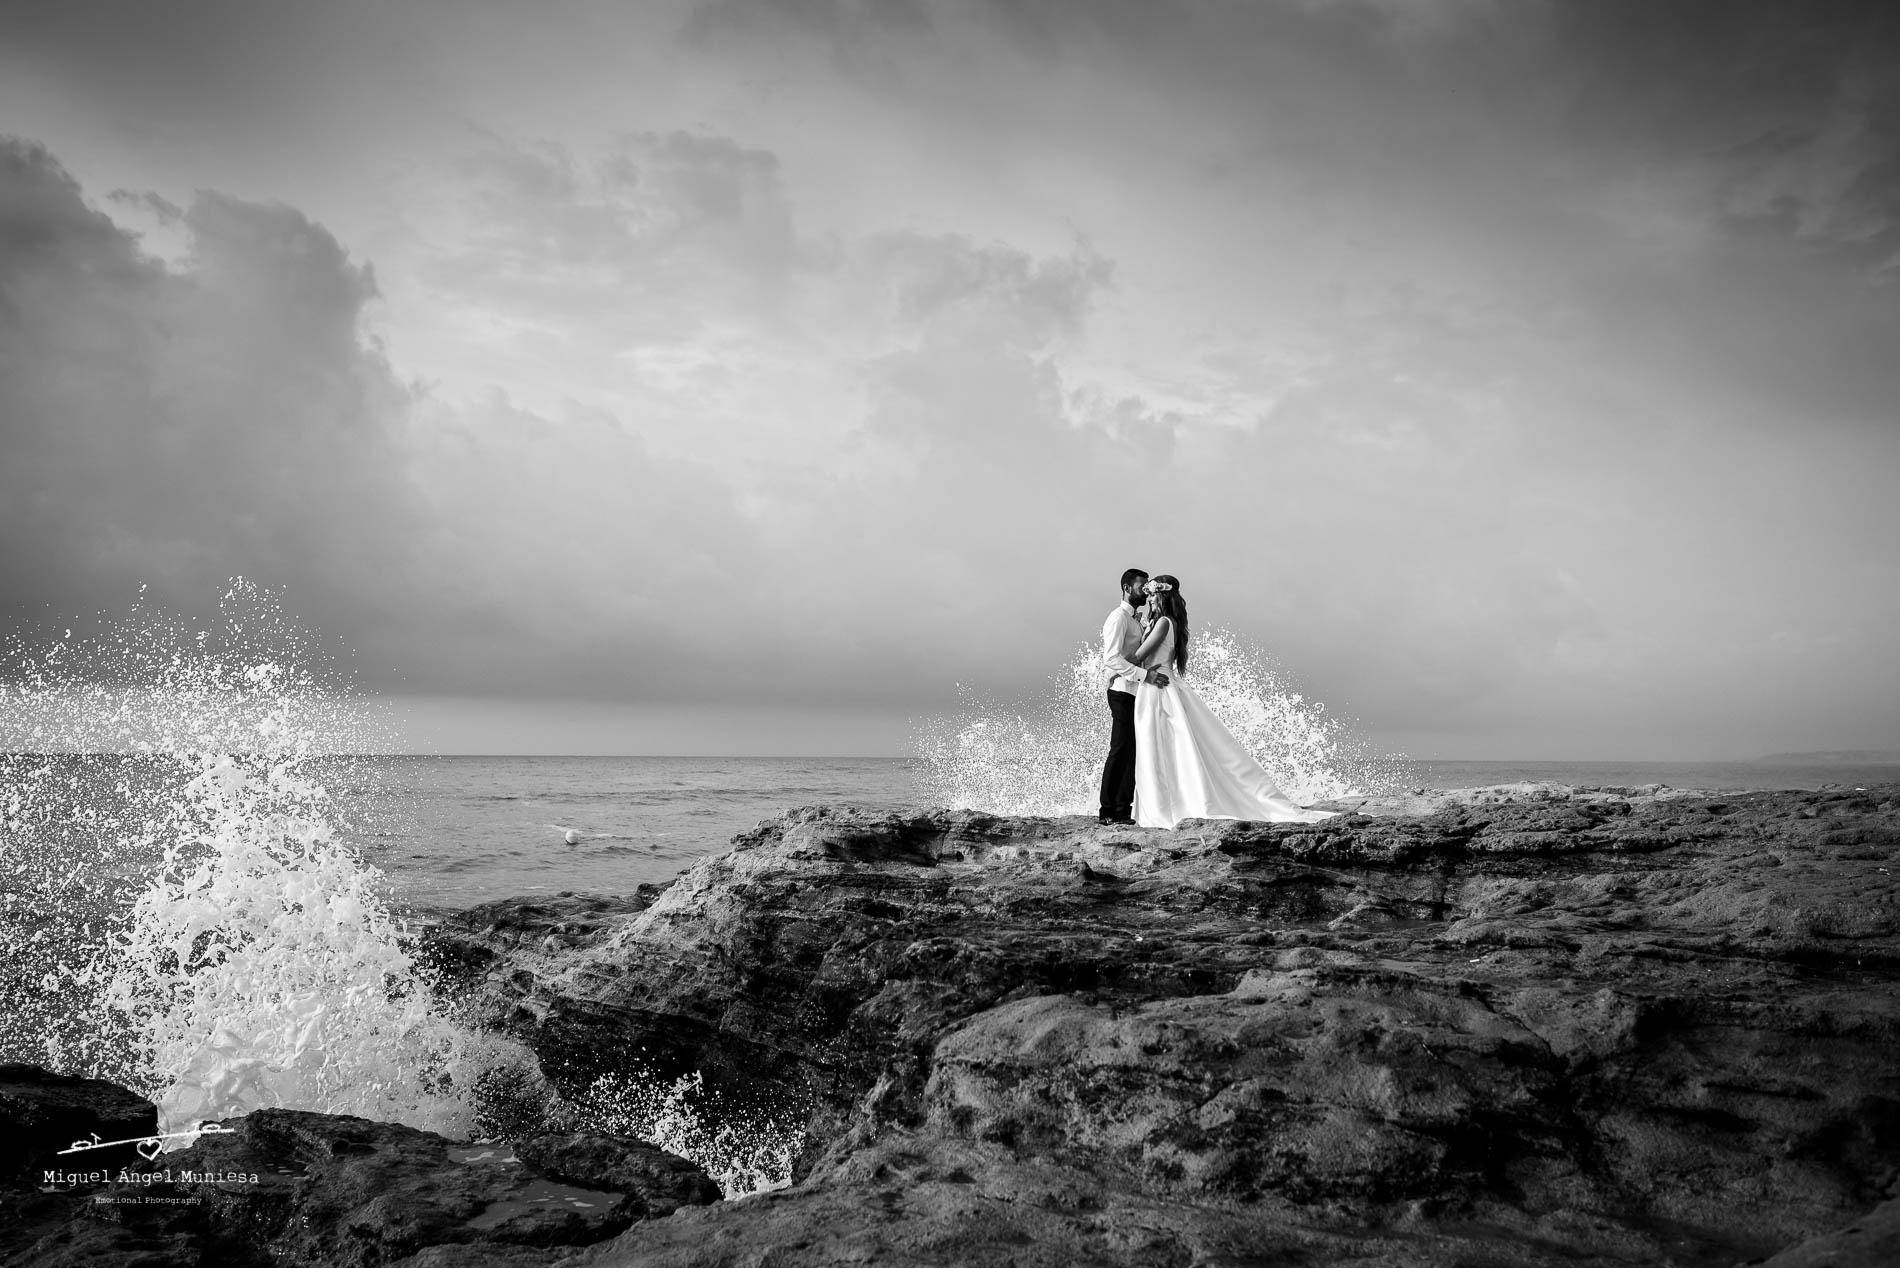 boda, fotografia de boda, boda zaragoza, fotografia, wedding, wedding photography, miguel angel muniesa, fotografo boda Zaragoza, fotografo boda, destination wedding_ 0006